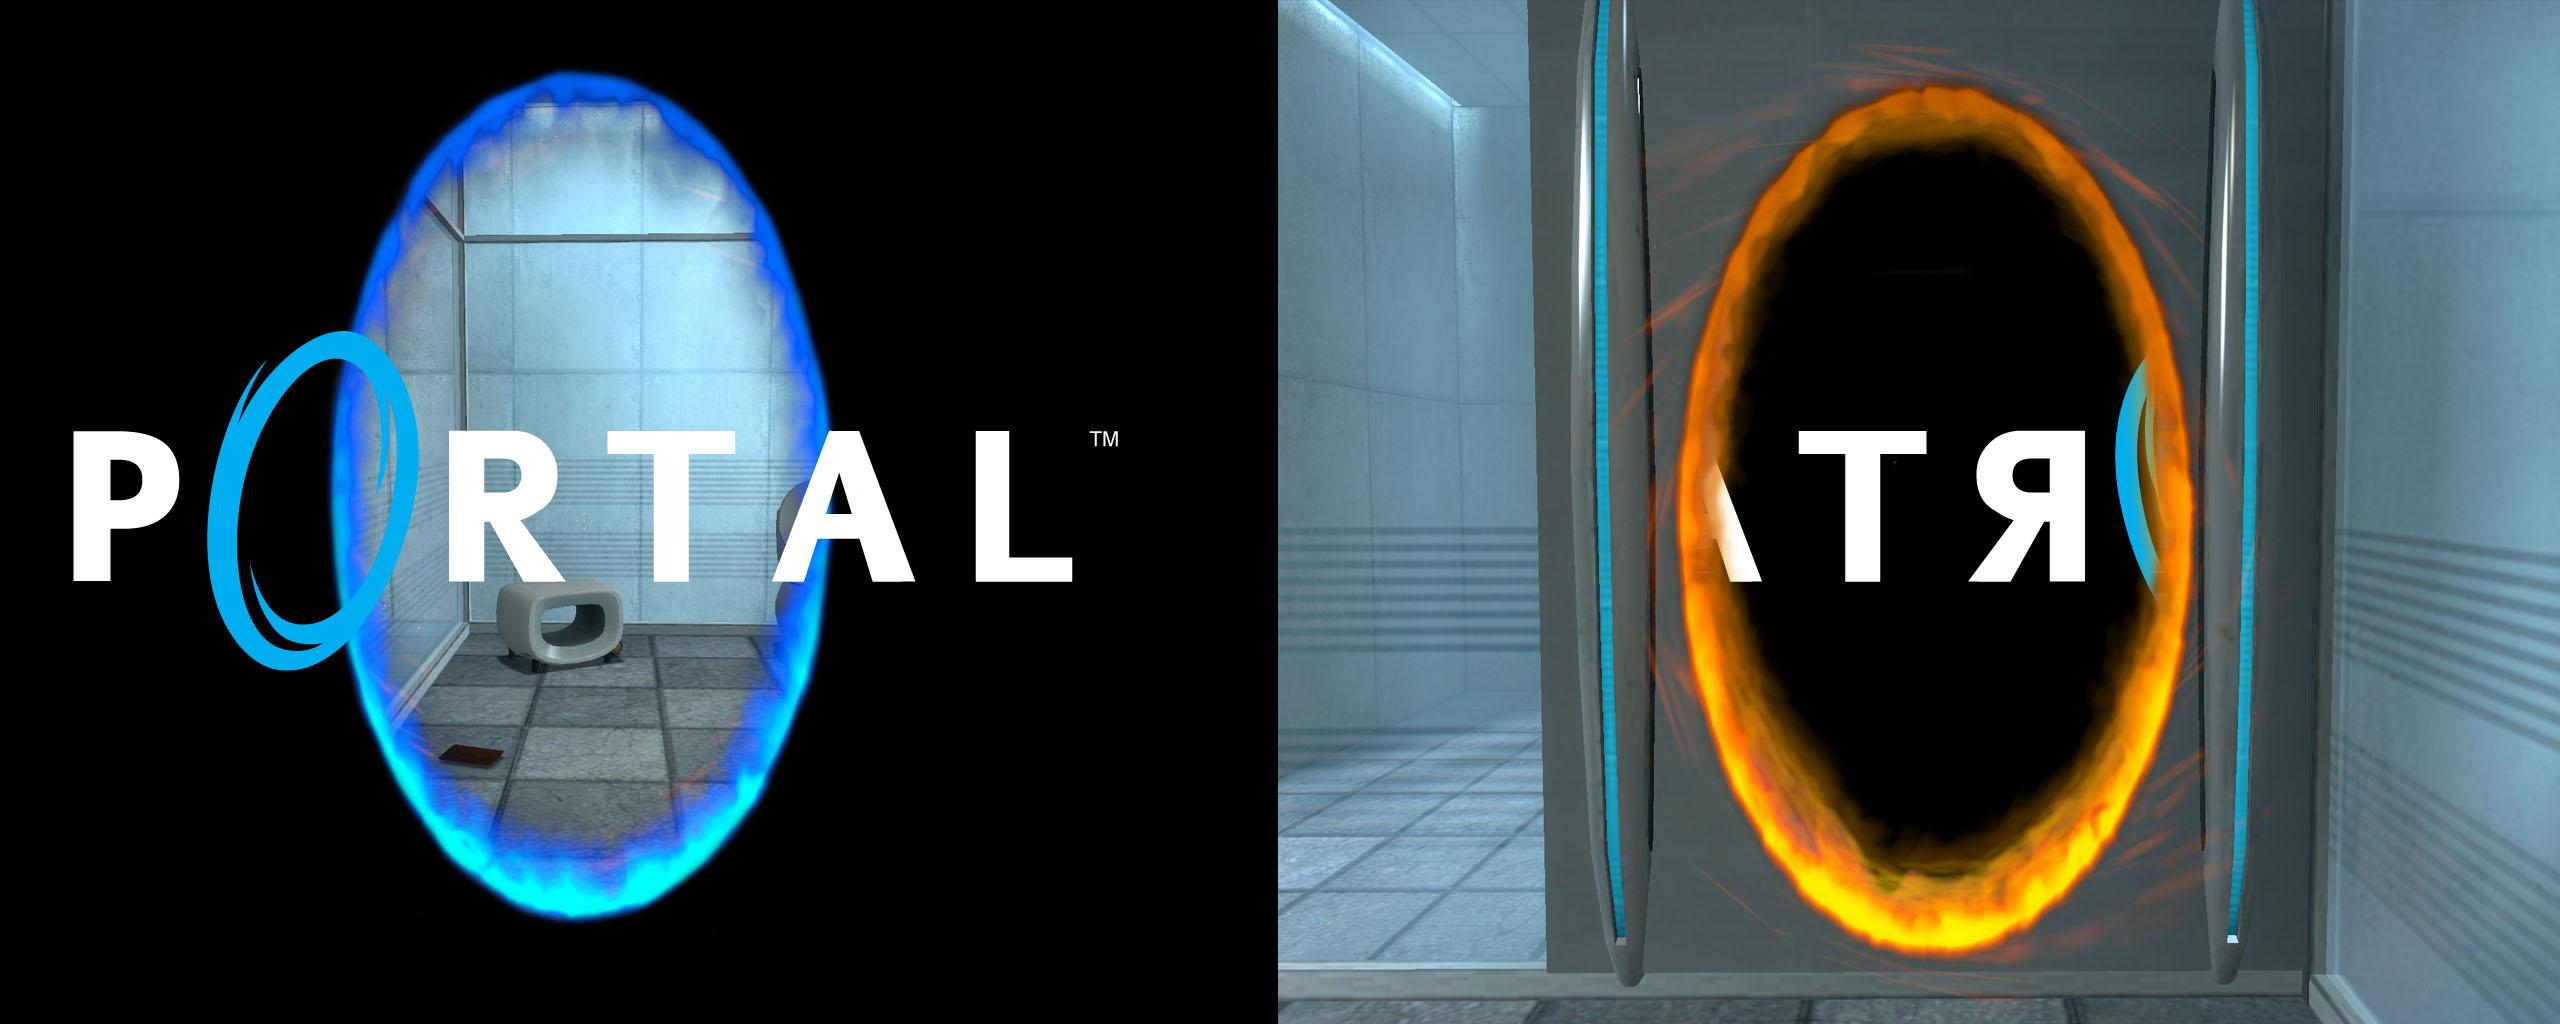 50] Portal Dual Screen Wallpaper on WallpaperSafari 2560x1024